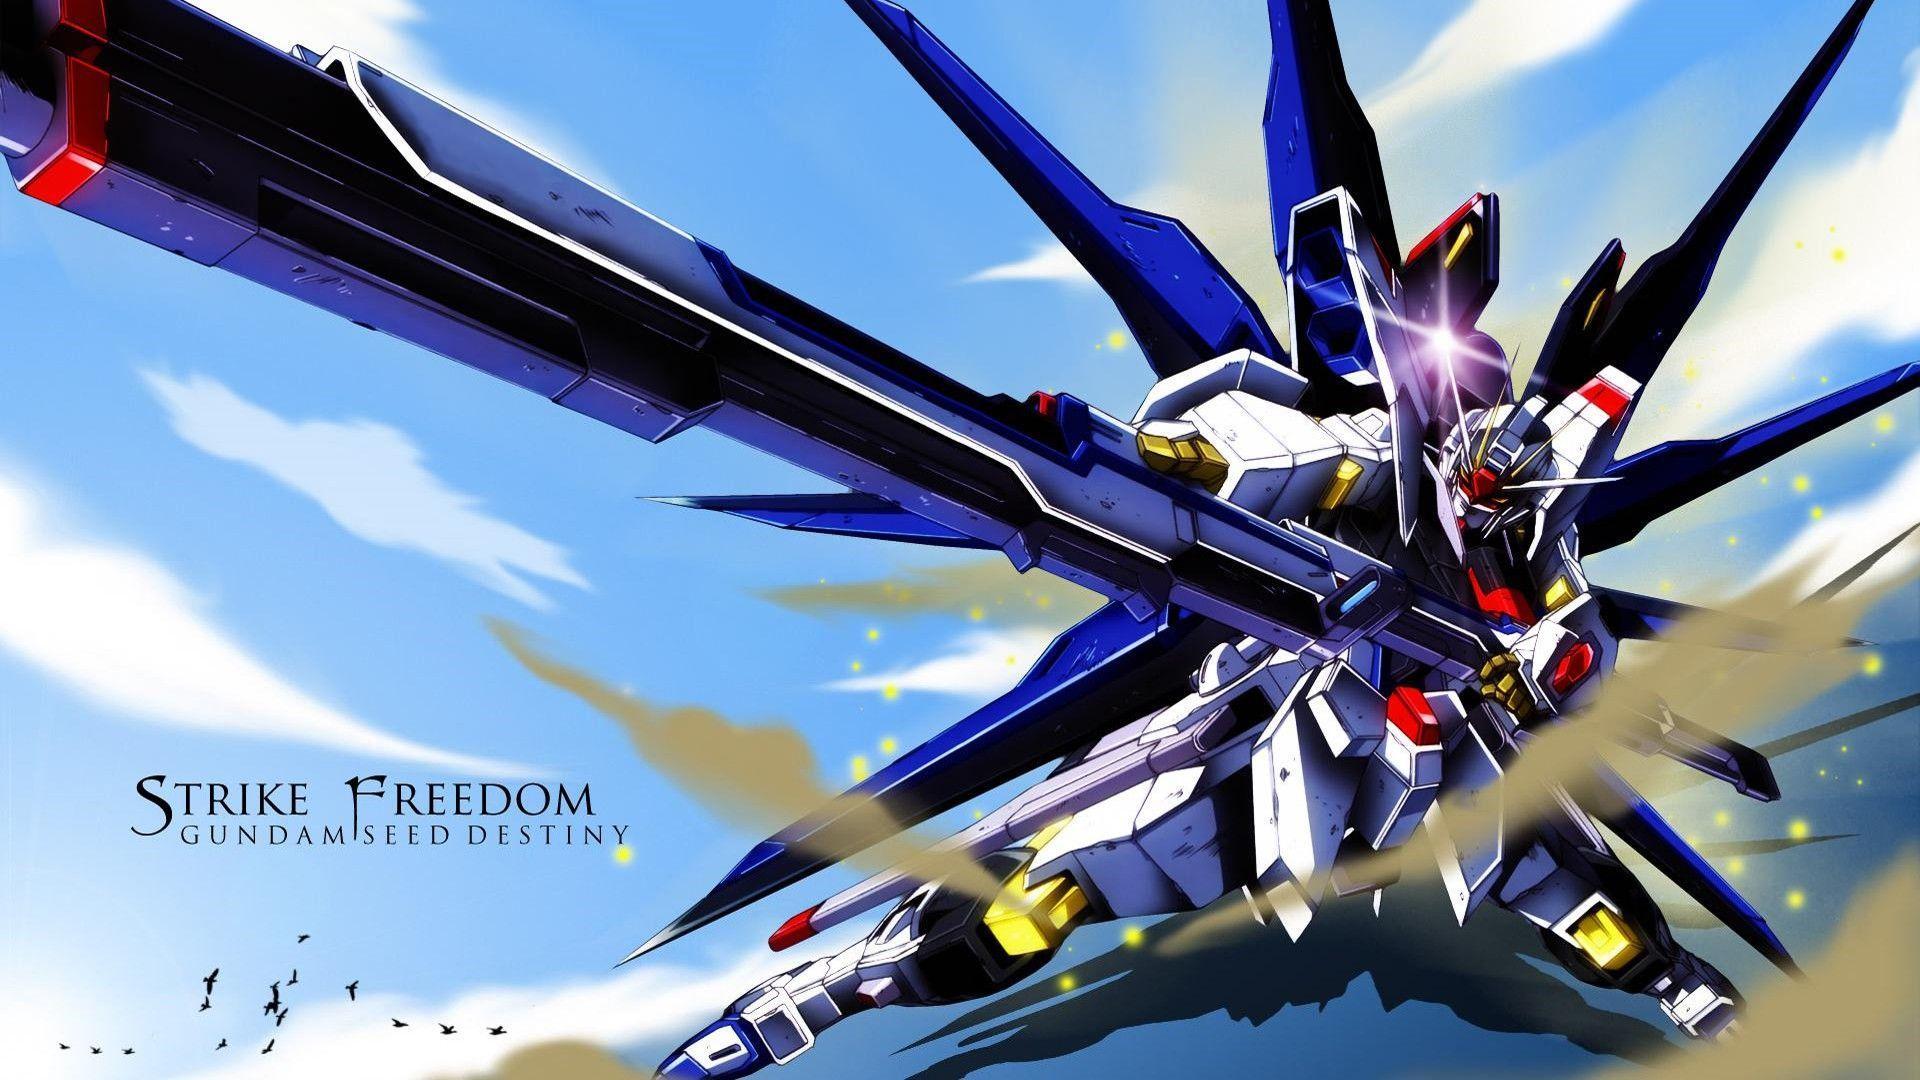 Gundam Strike Freedom Wallpapers Hd Wallpaper Cave